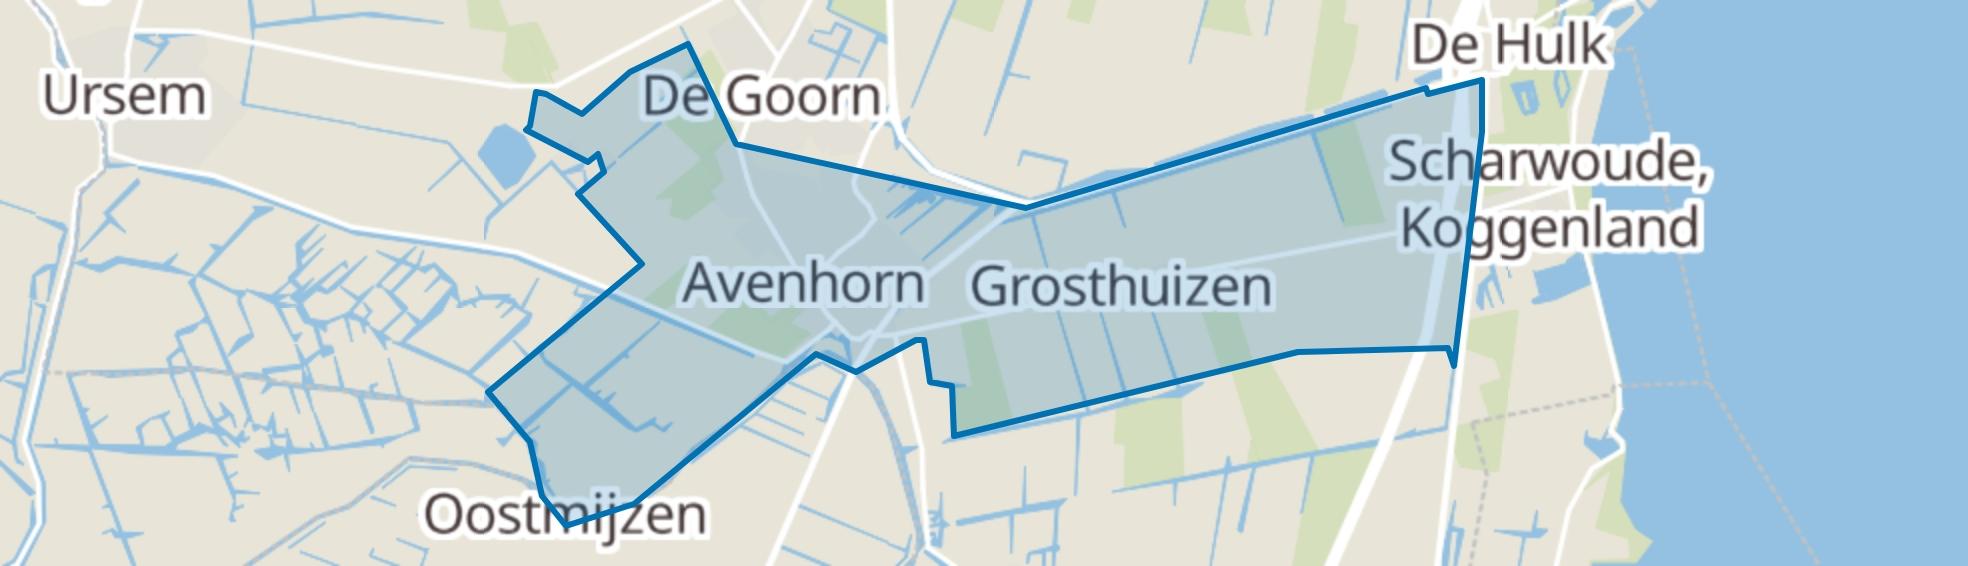 Avenhorn map